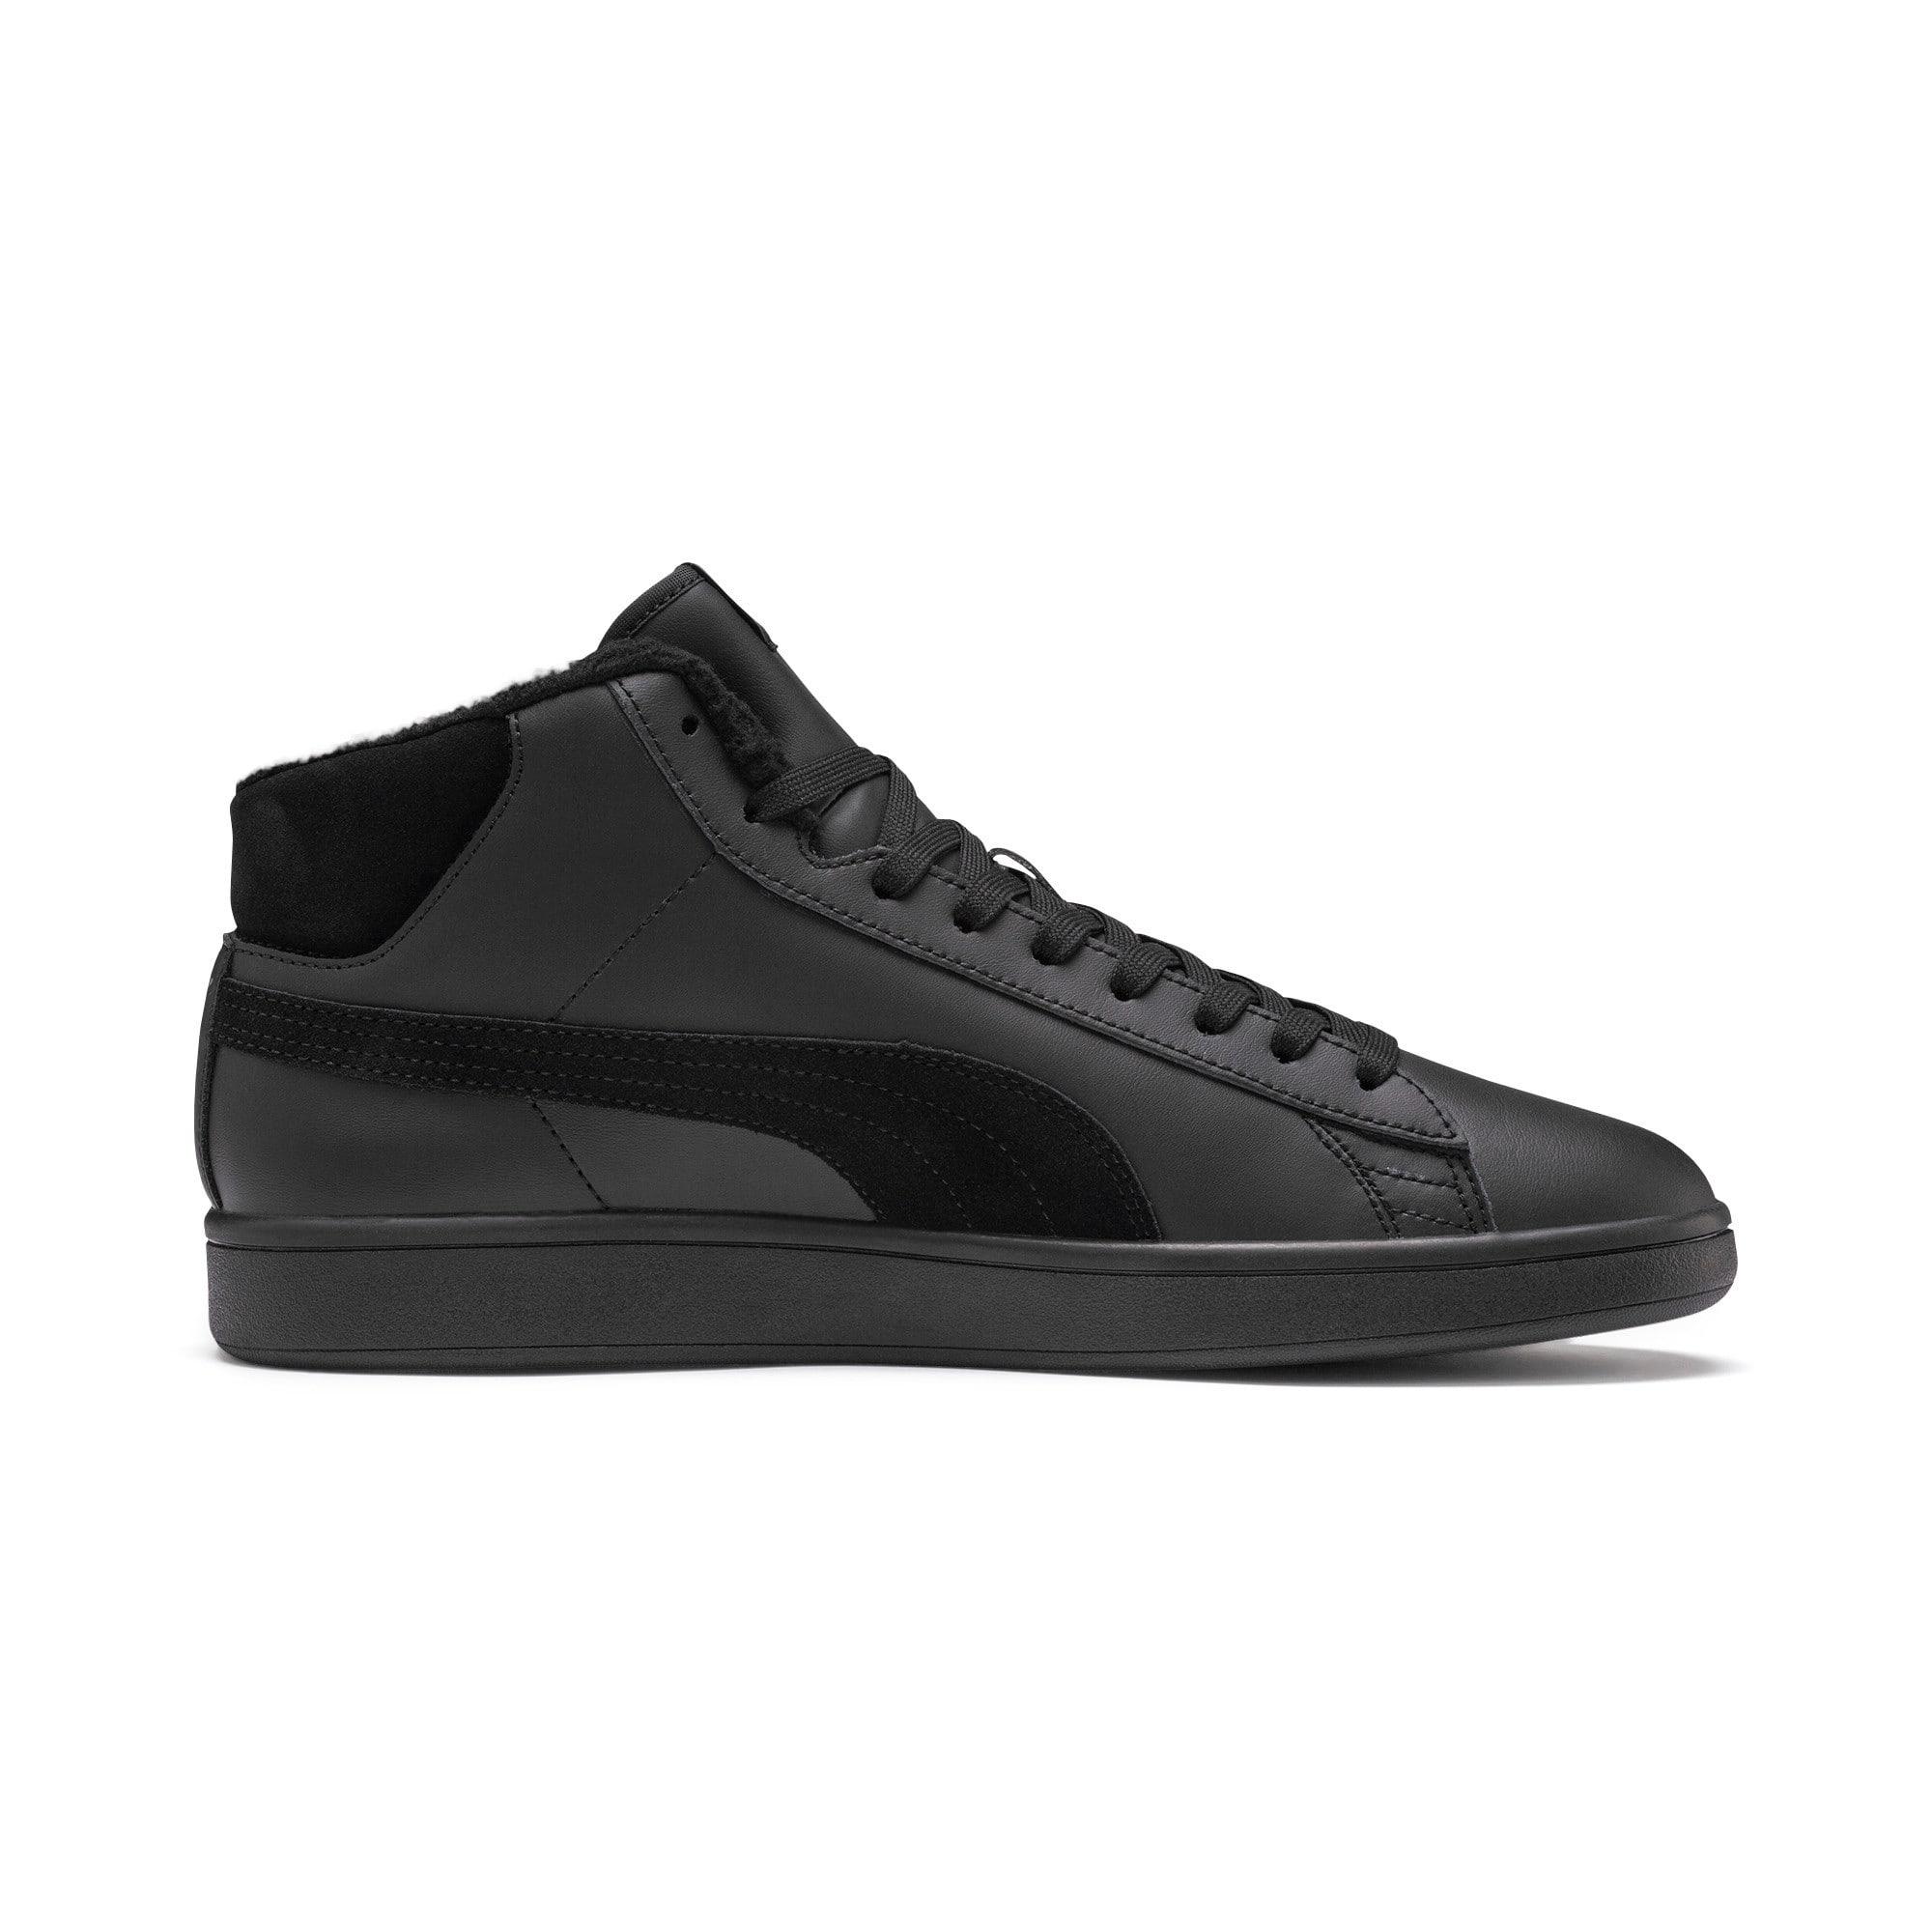 Thumbnail 6 of Smash v2 Mid Winterized Leather High Tops, Puma Black-CASTLEROCK, medium